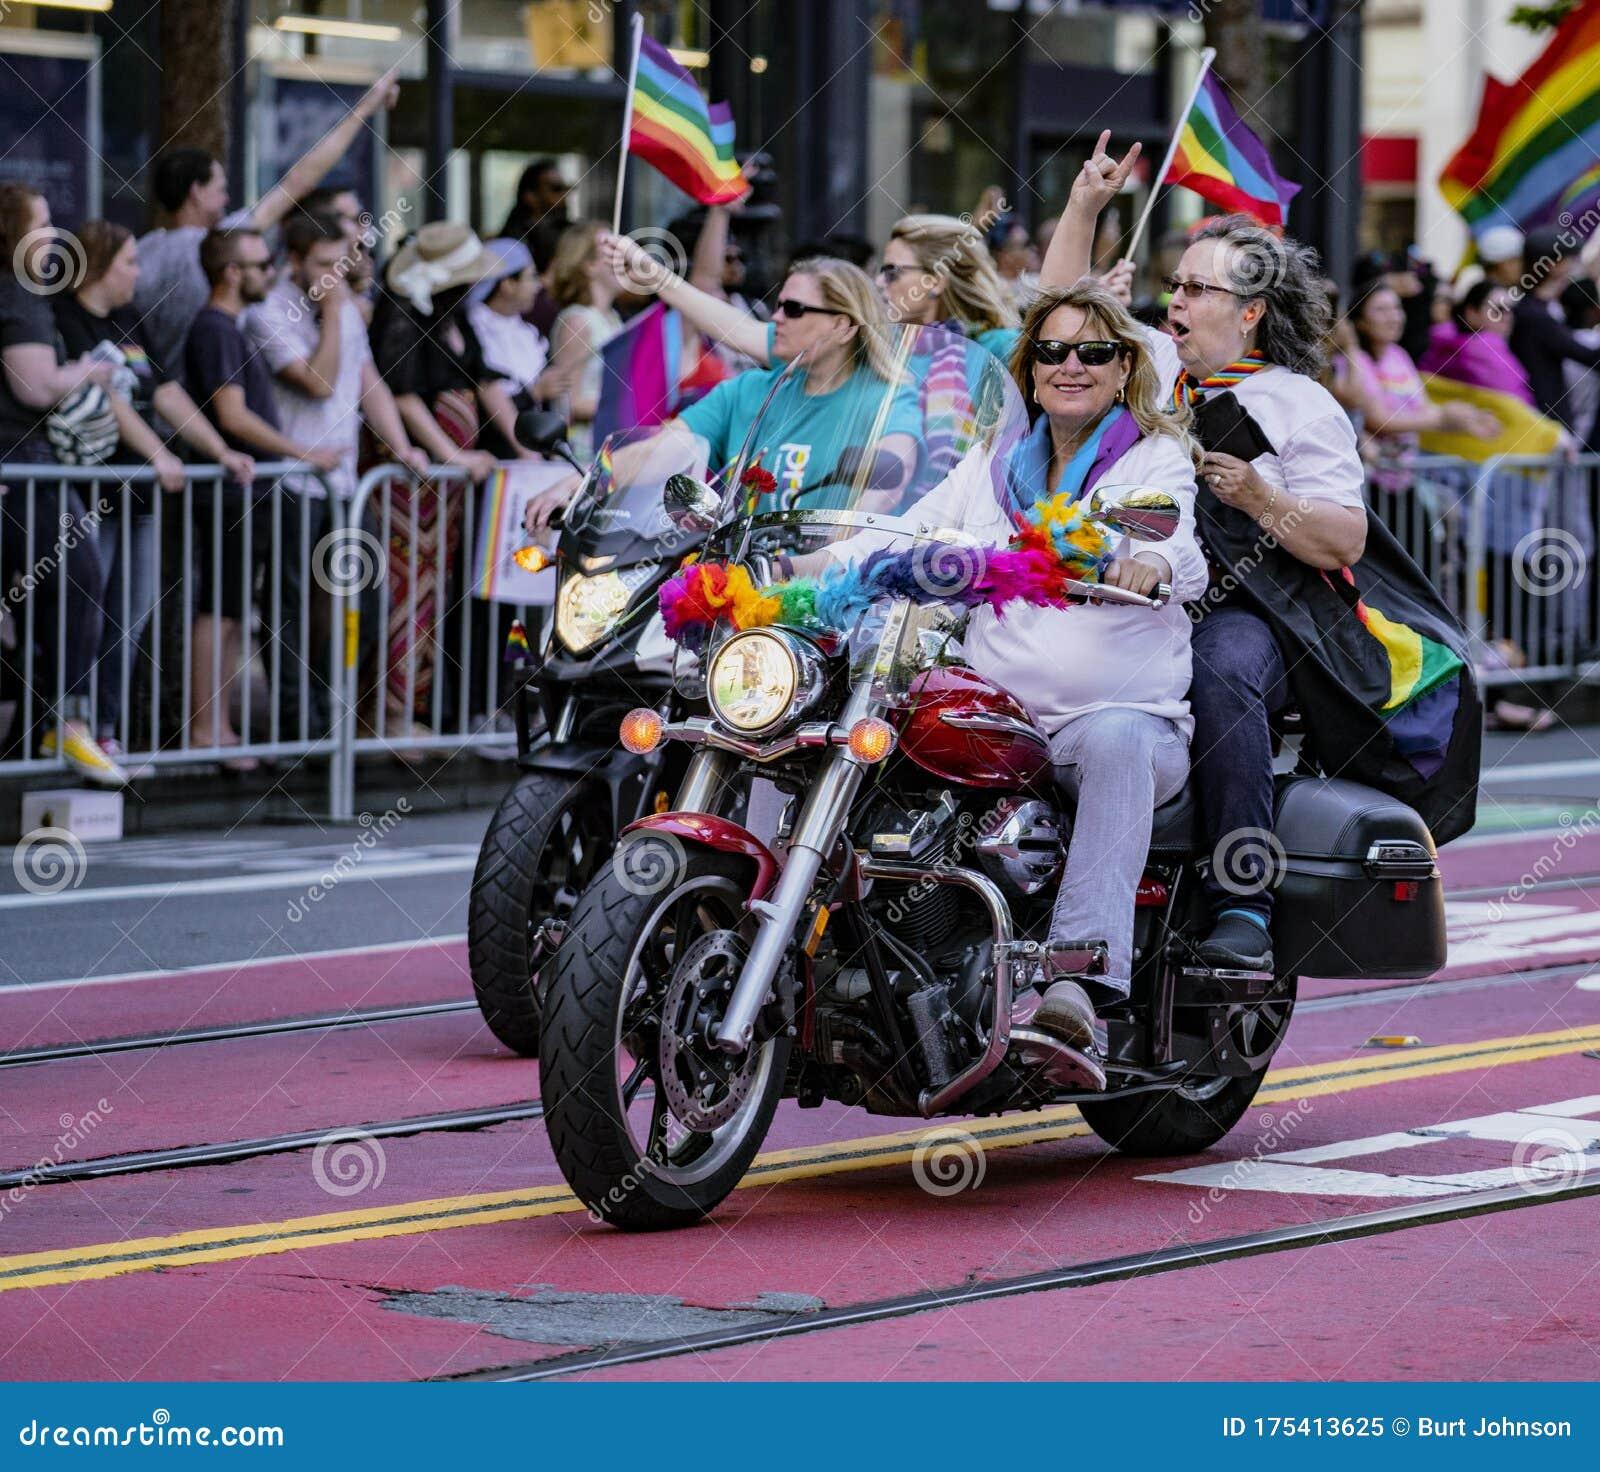 San Francisco Pride parade canceled on 50th anniversary